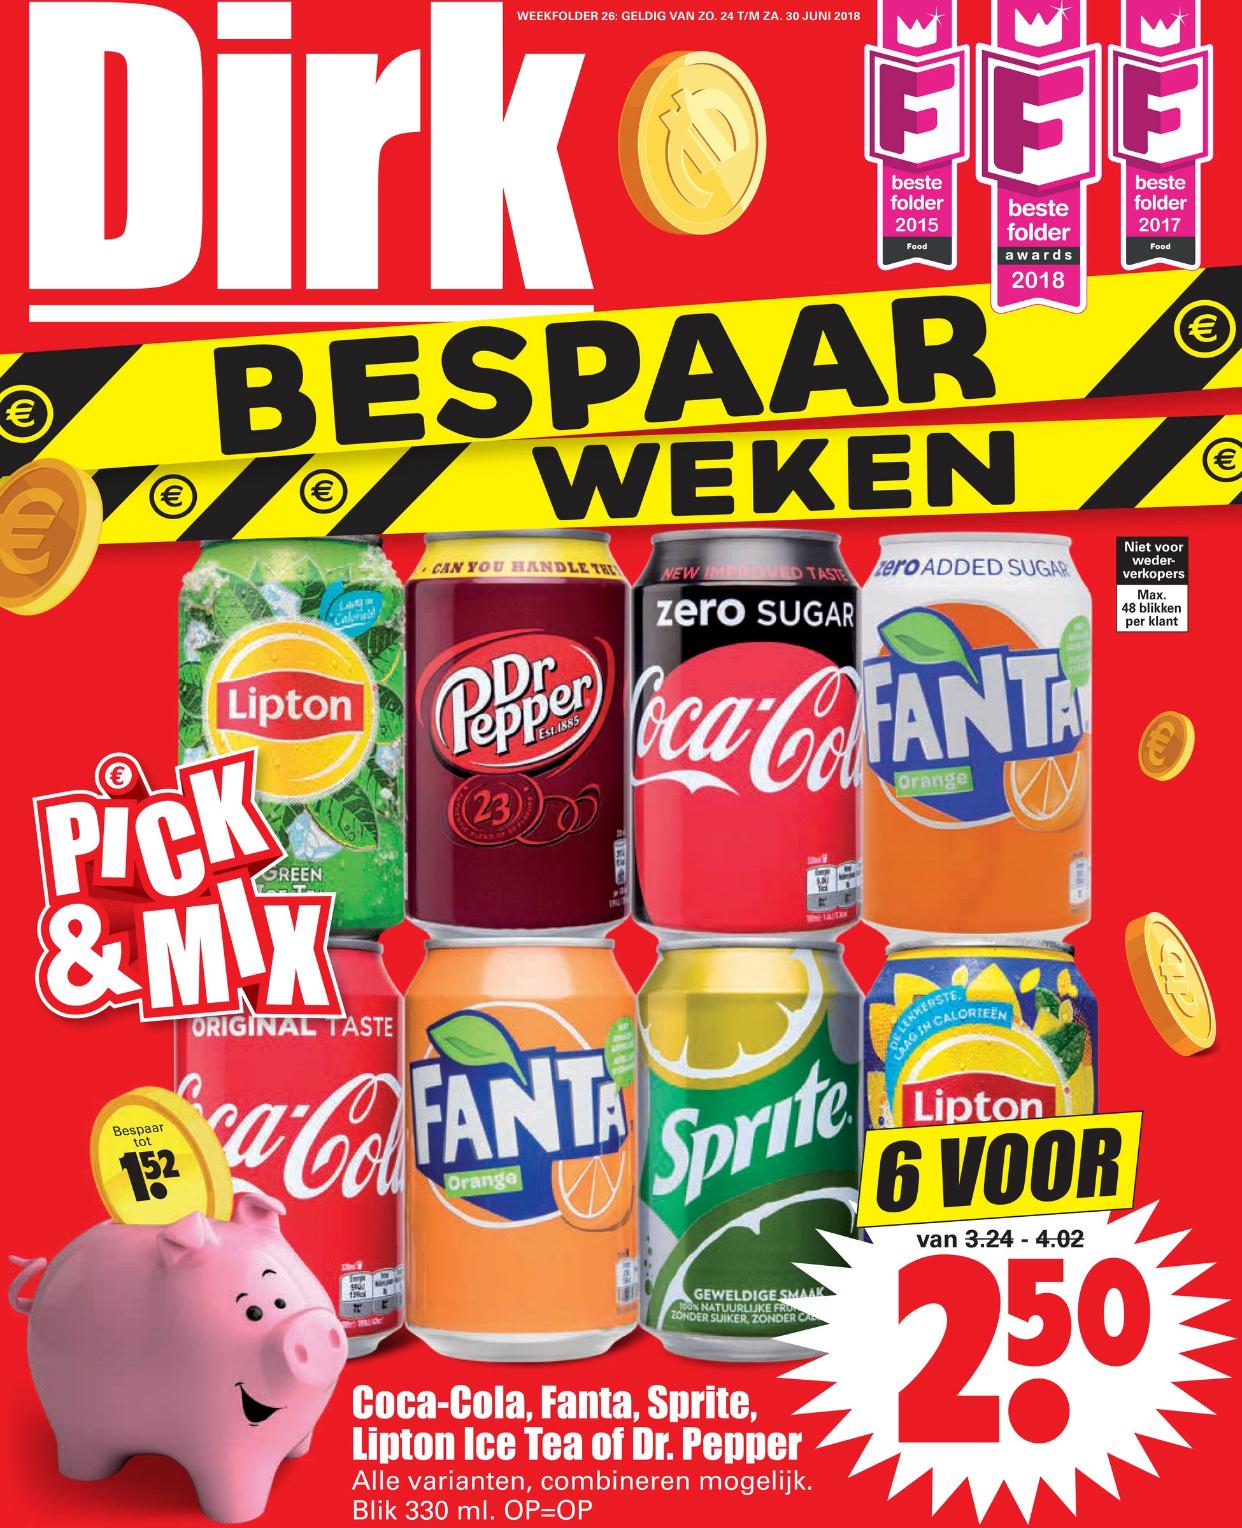 6 blikken frisdrank €2,50 en 3 pakken Mora oven snacks €5 @dirk